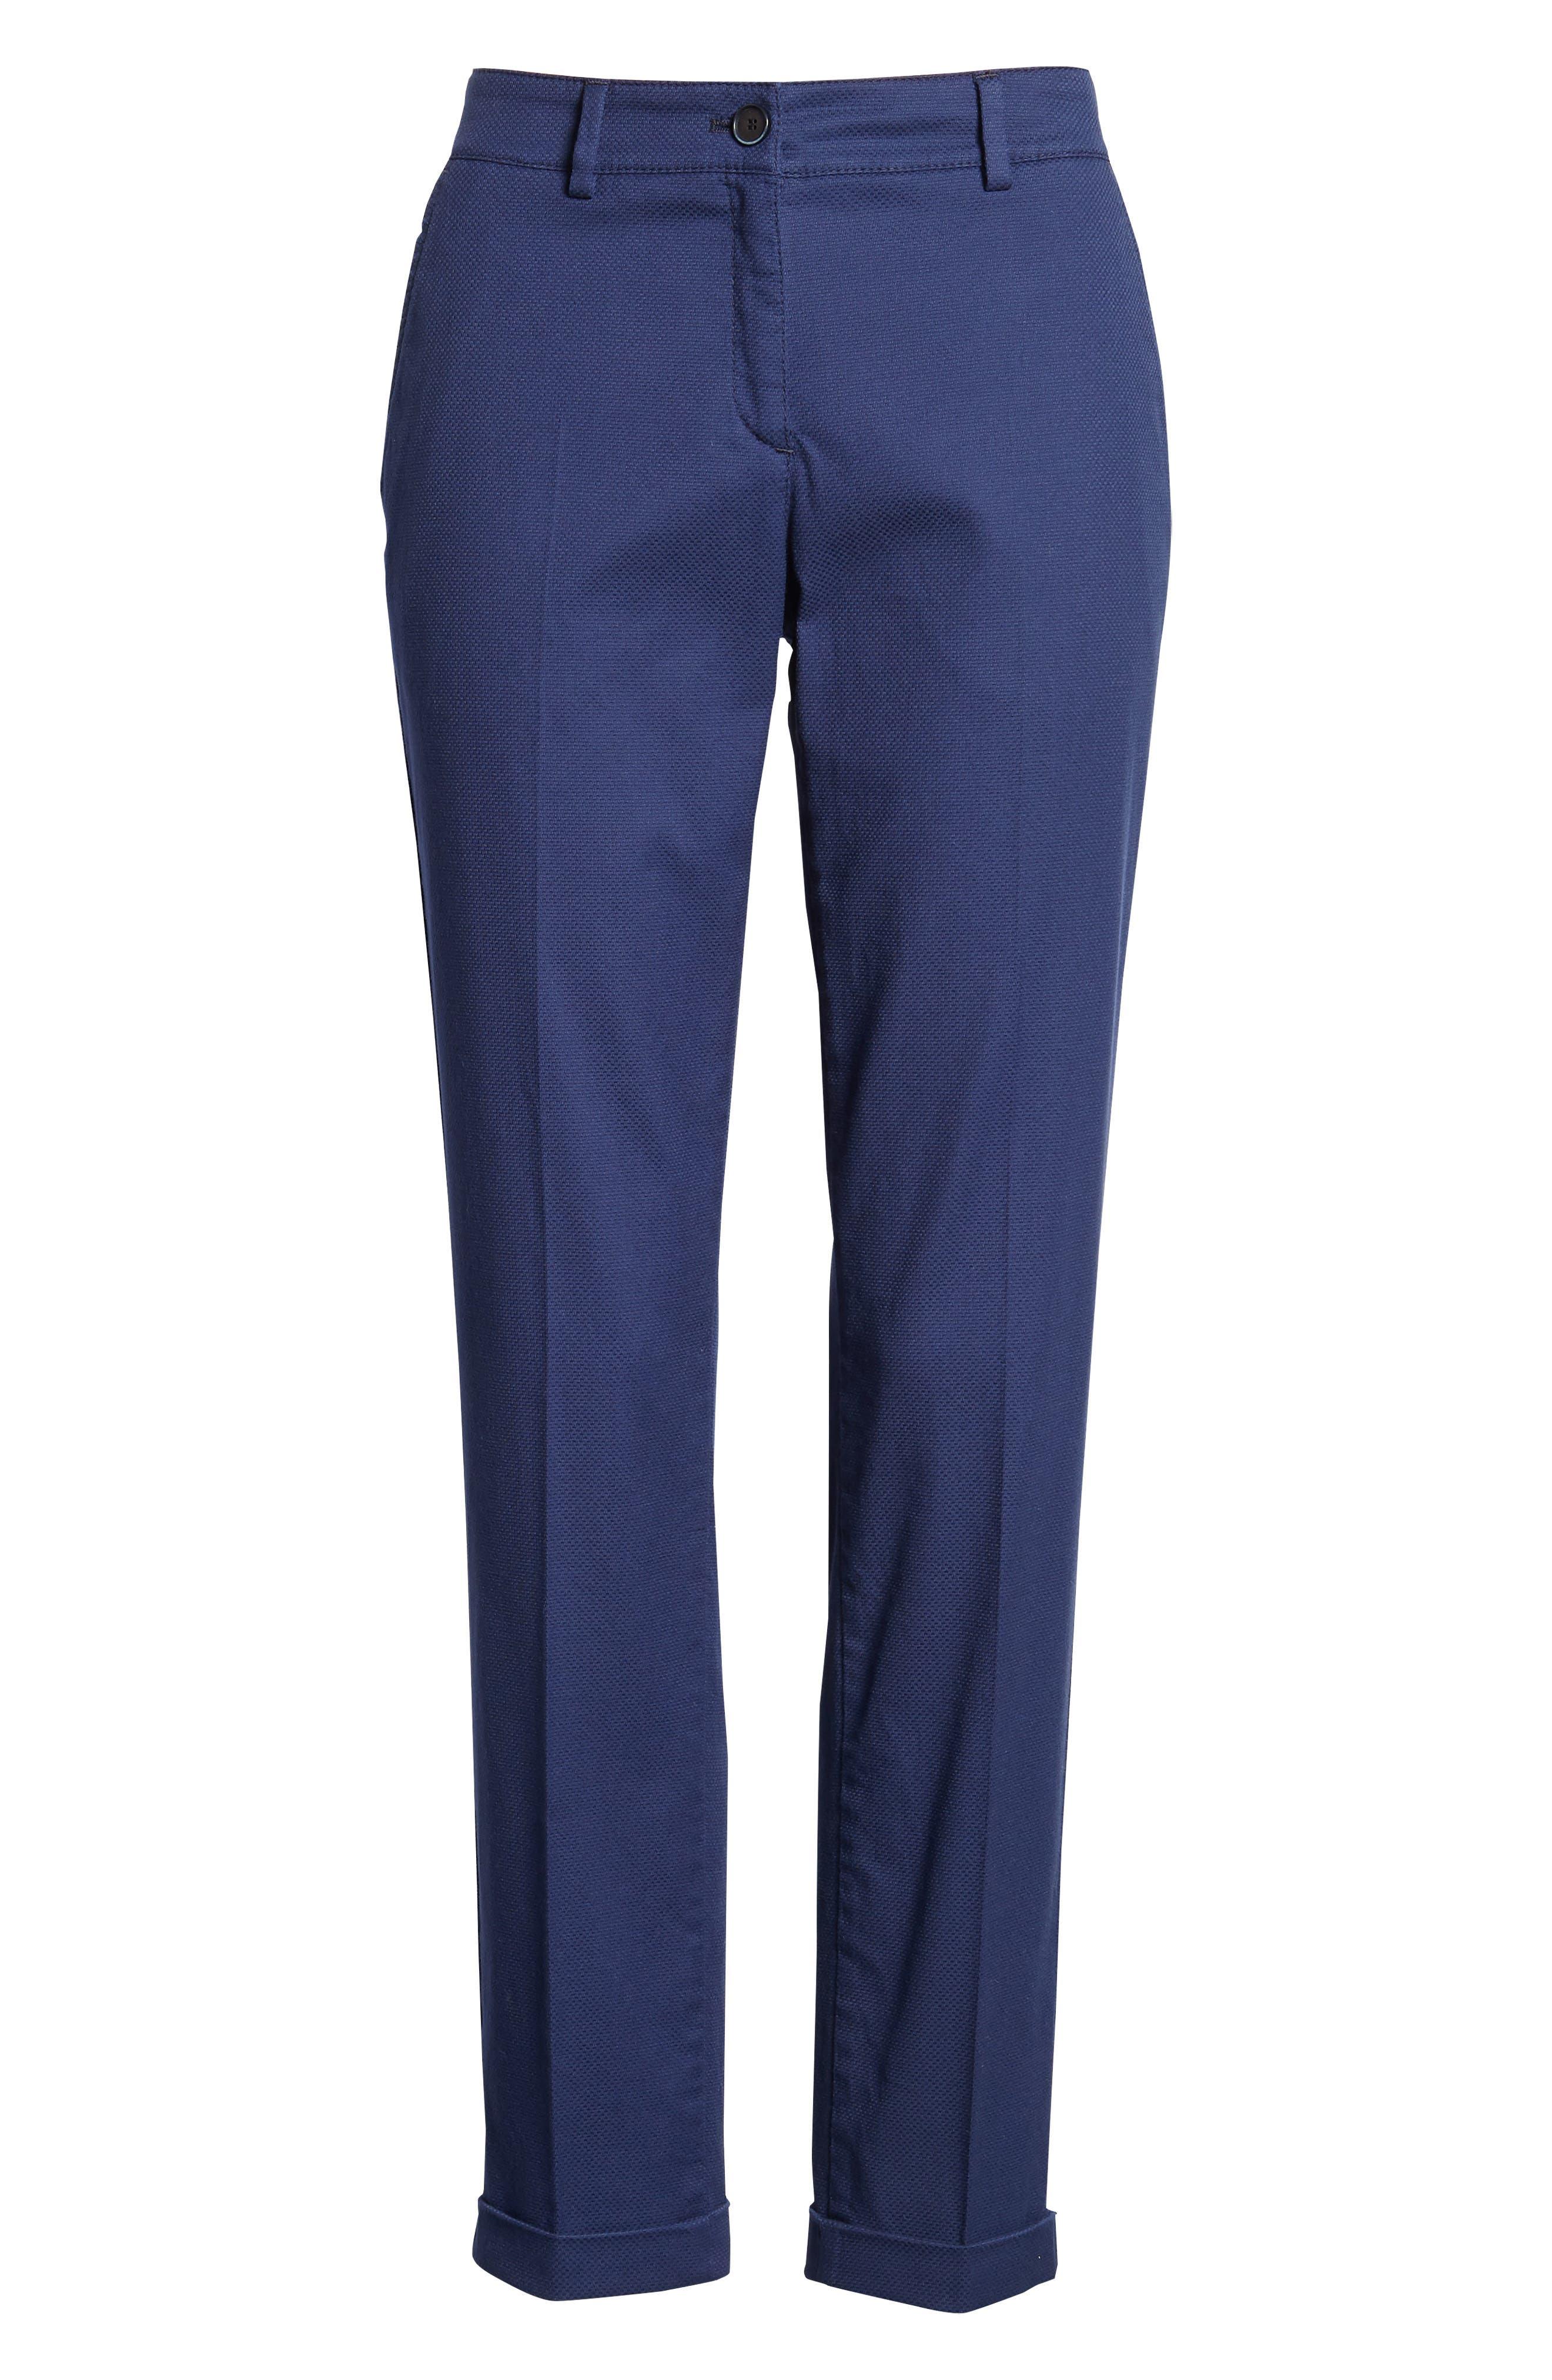 Maron Cuffed Straight Leg Pants,                             Alternate thumbnail 7, color,                             422